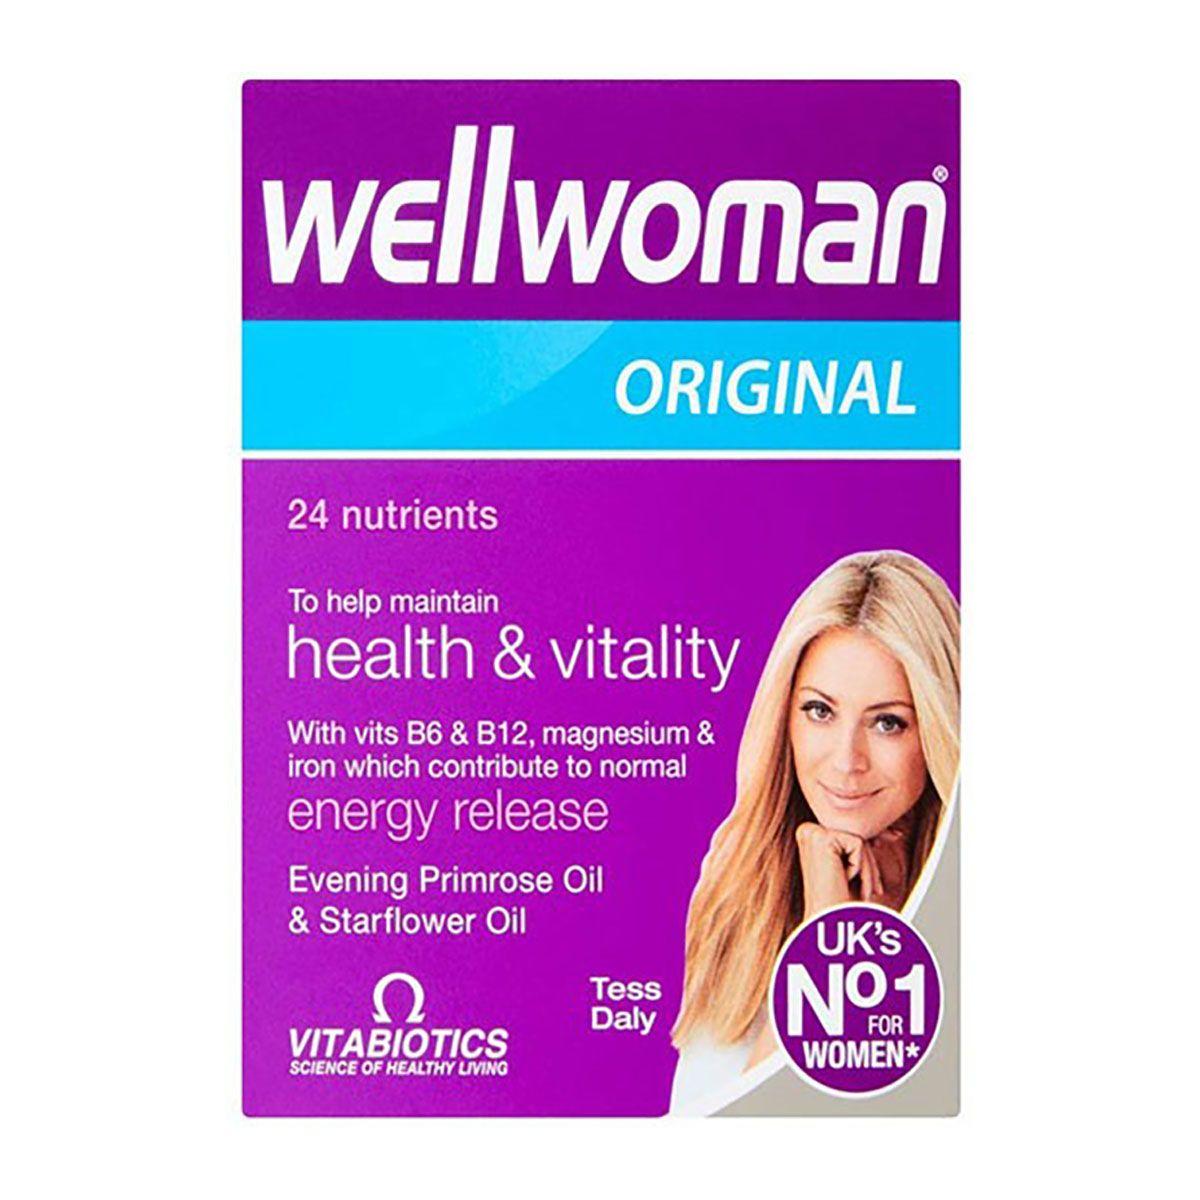 Vitabiotics Wellwoman Original 24 Nutrients To Help Maintain Health & Vitality